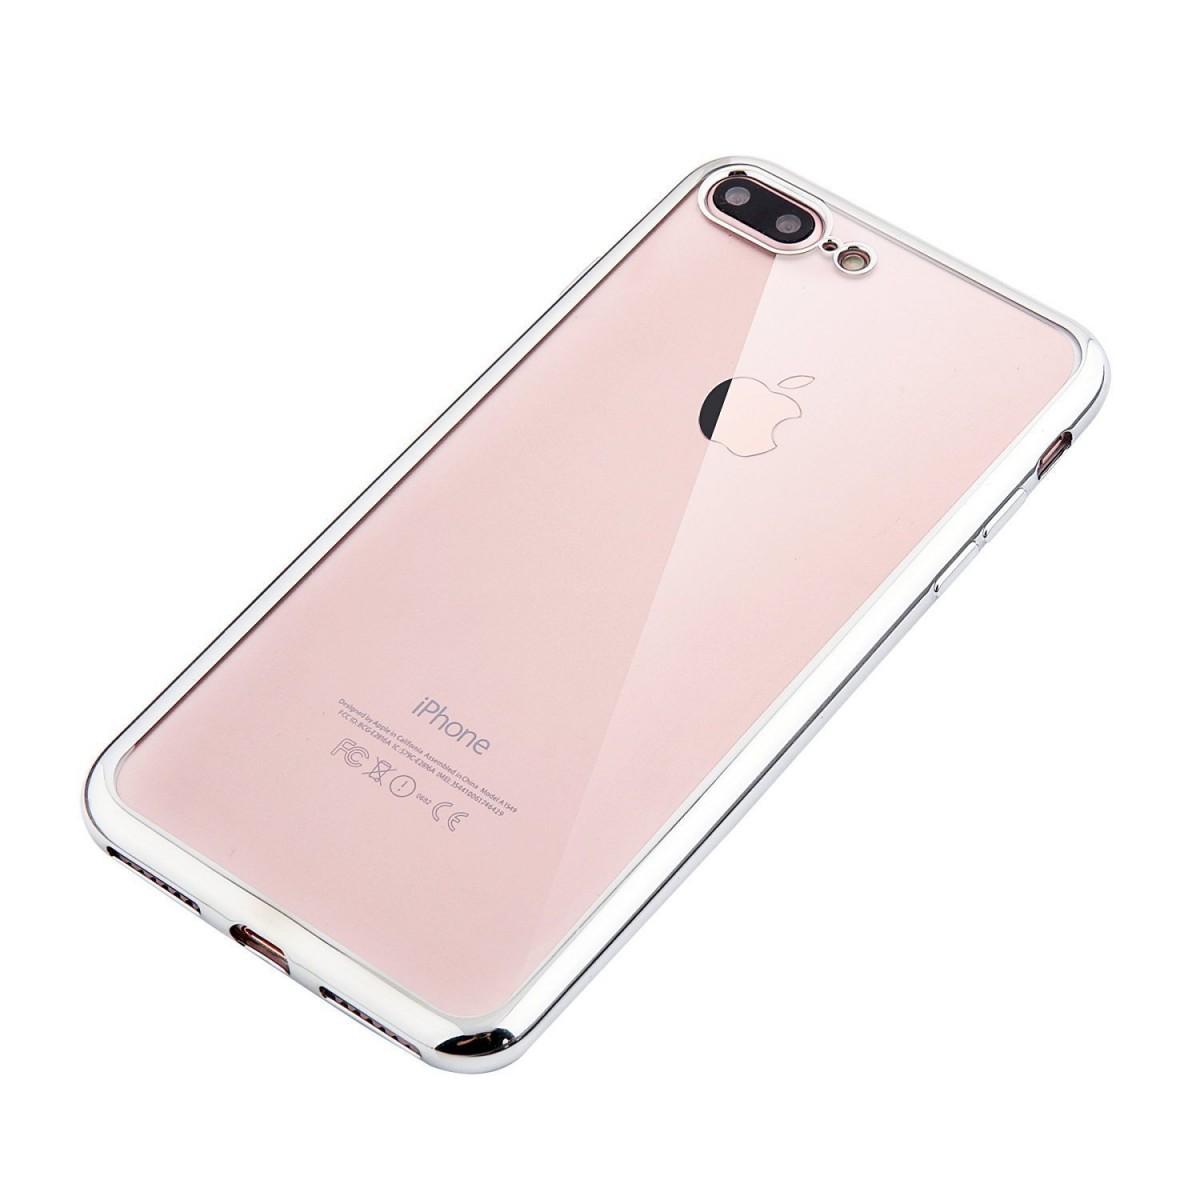 Elegantní obal / kryt RING pro iPhone 7 Plus - Stříbrný (silver)